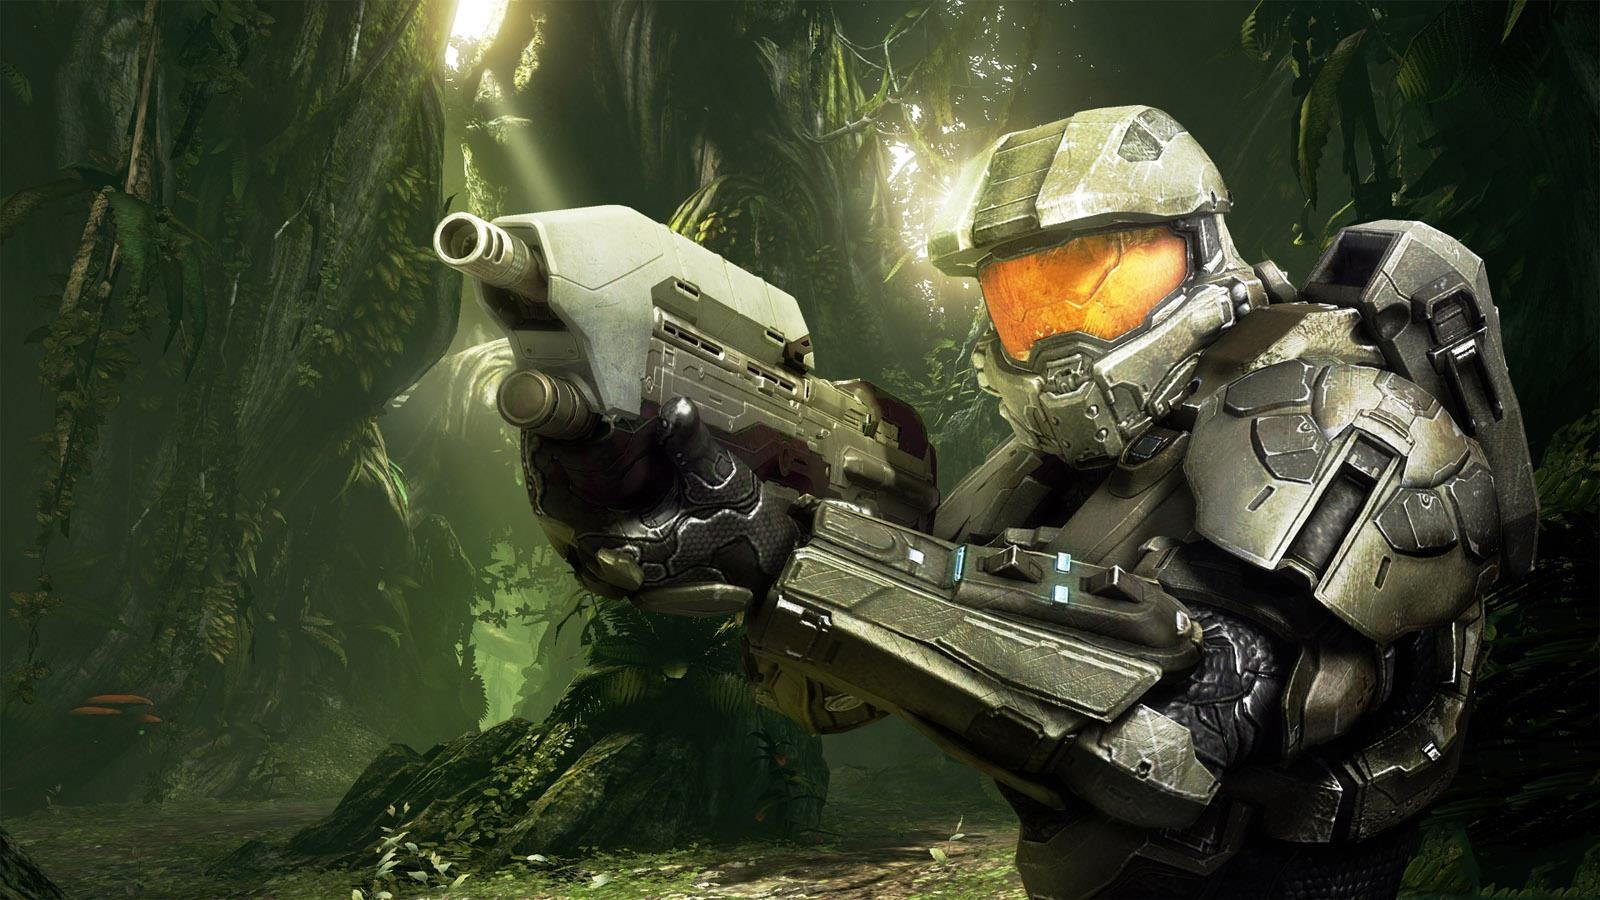 Master Chief Looking Awesome Halo Game Halo Cortana Halo